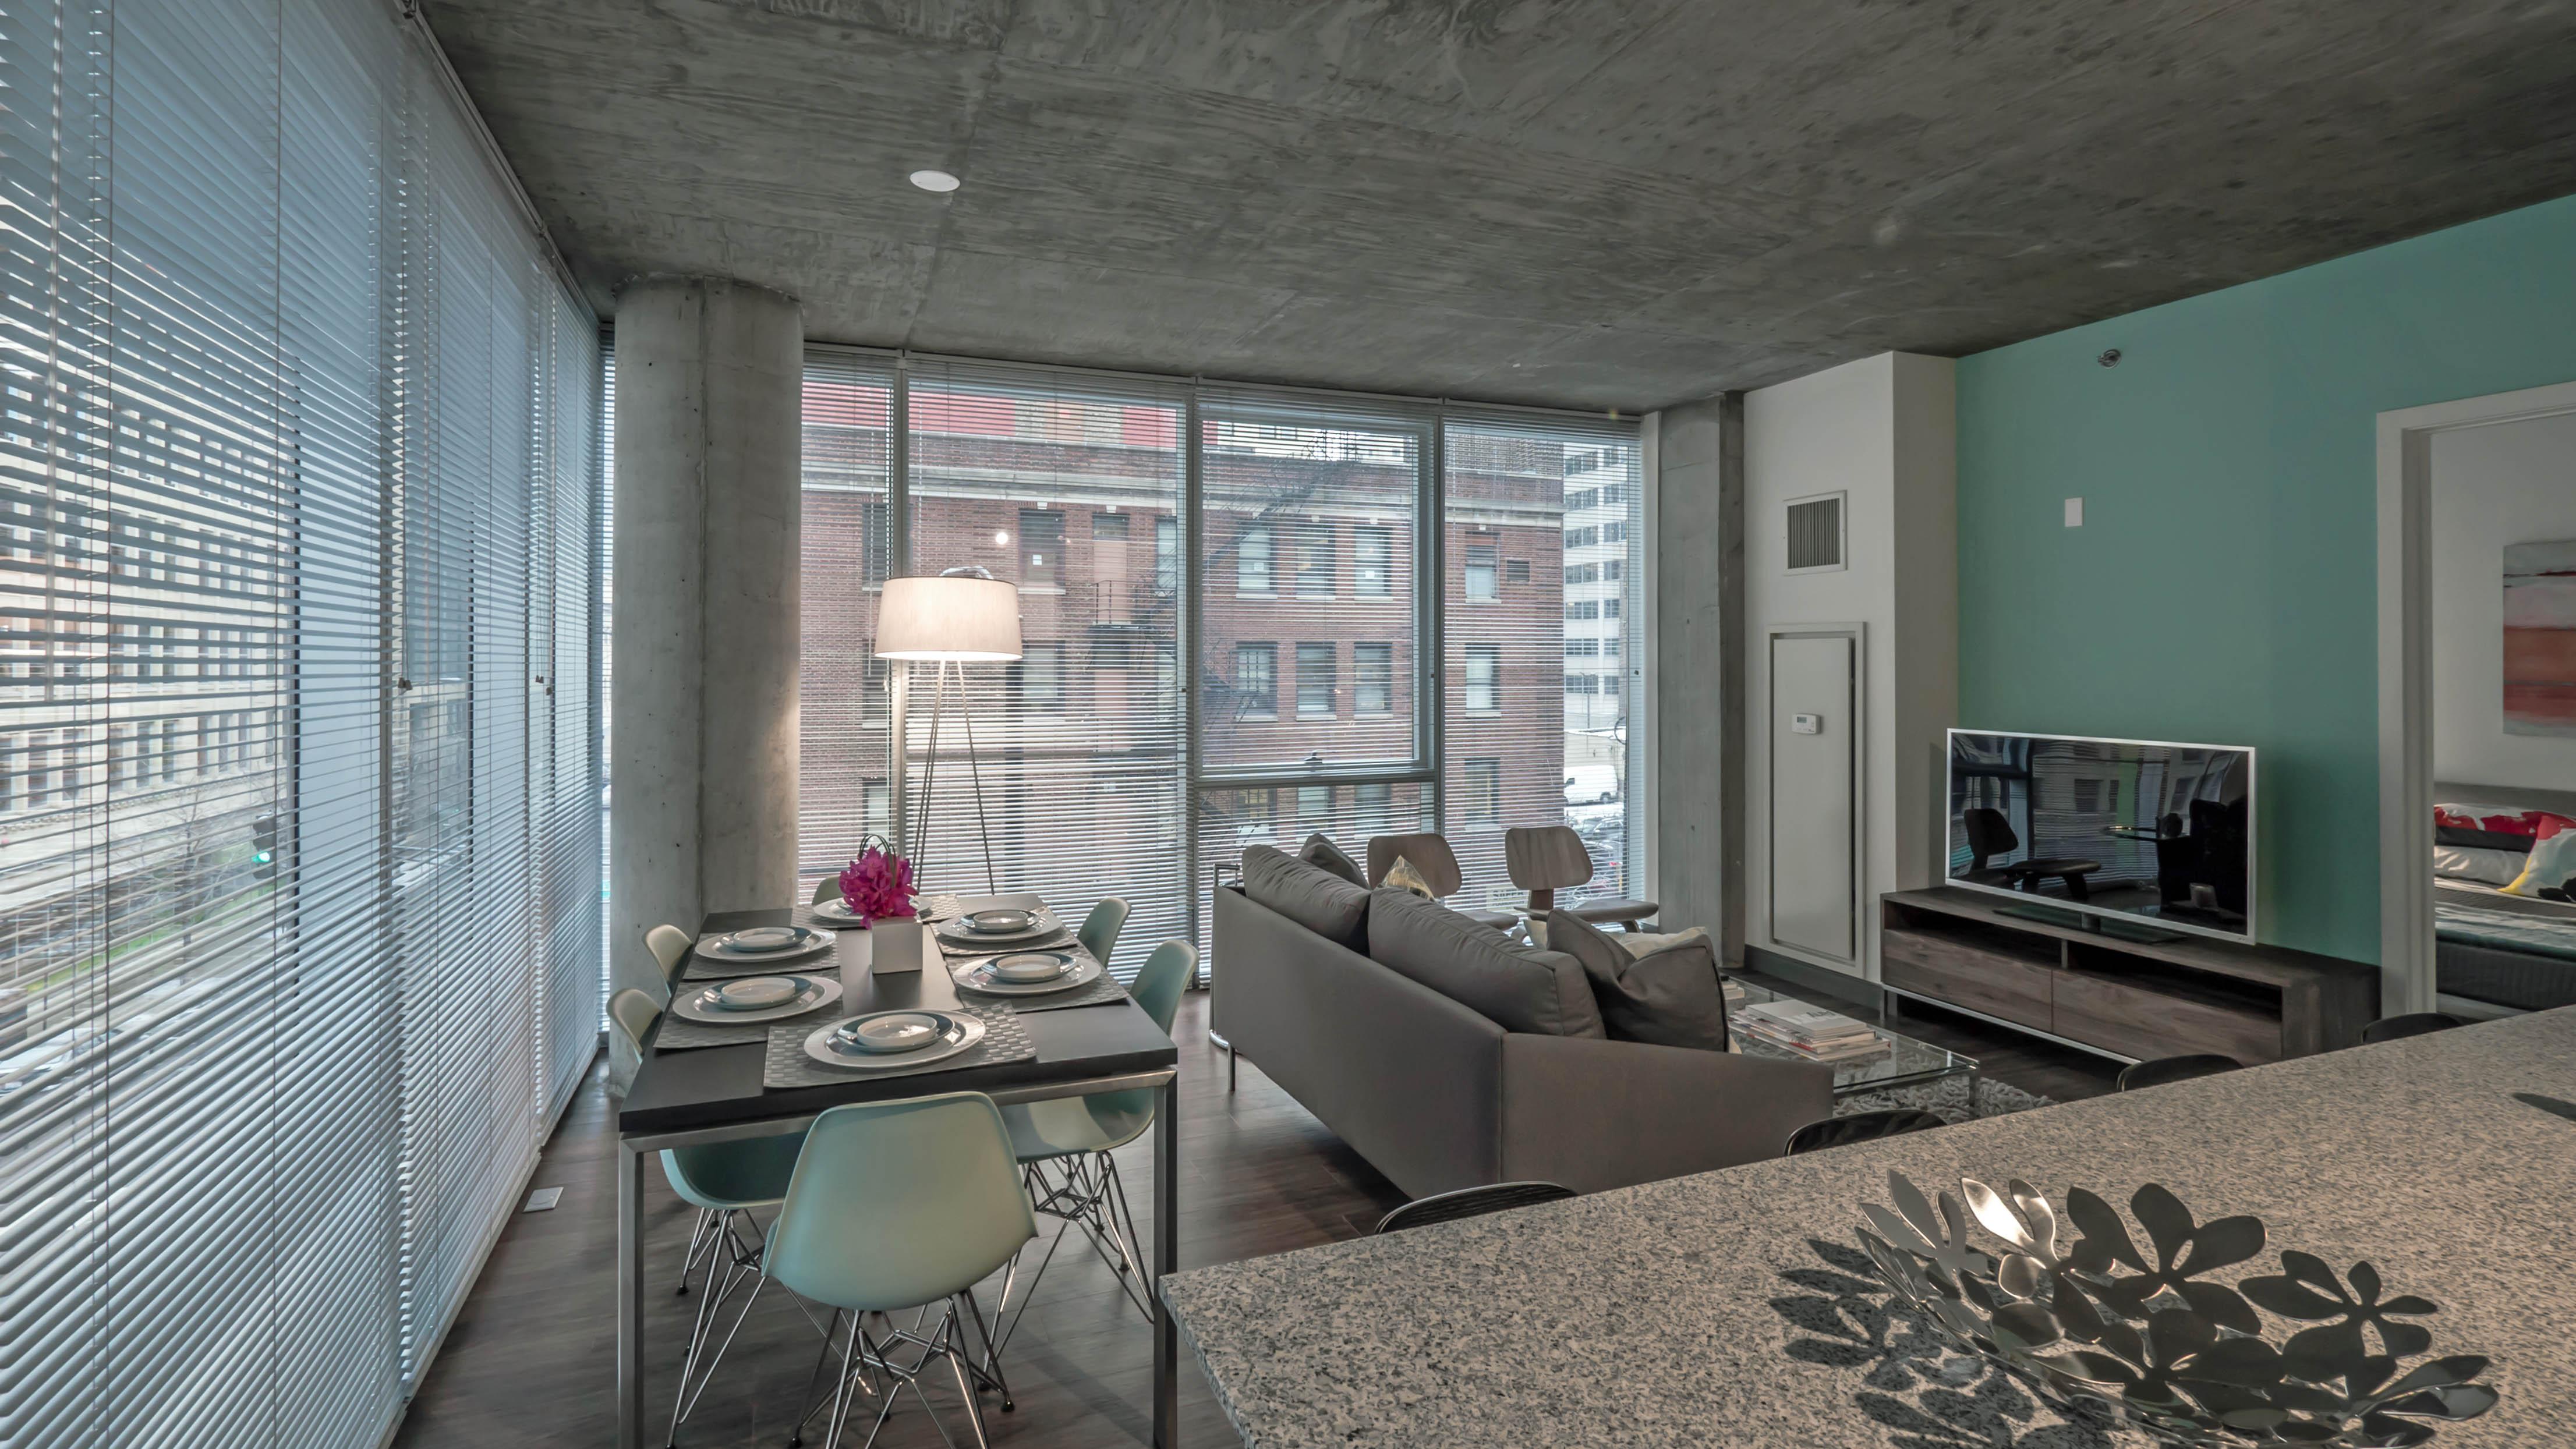 2 Story Aesthetic Apartment - 298007_Wonderful 2 Story Aesthetic Apartment - 298007  2018_323895.jpg